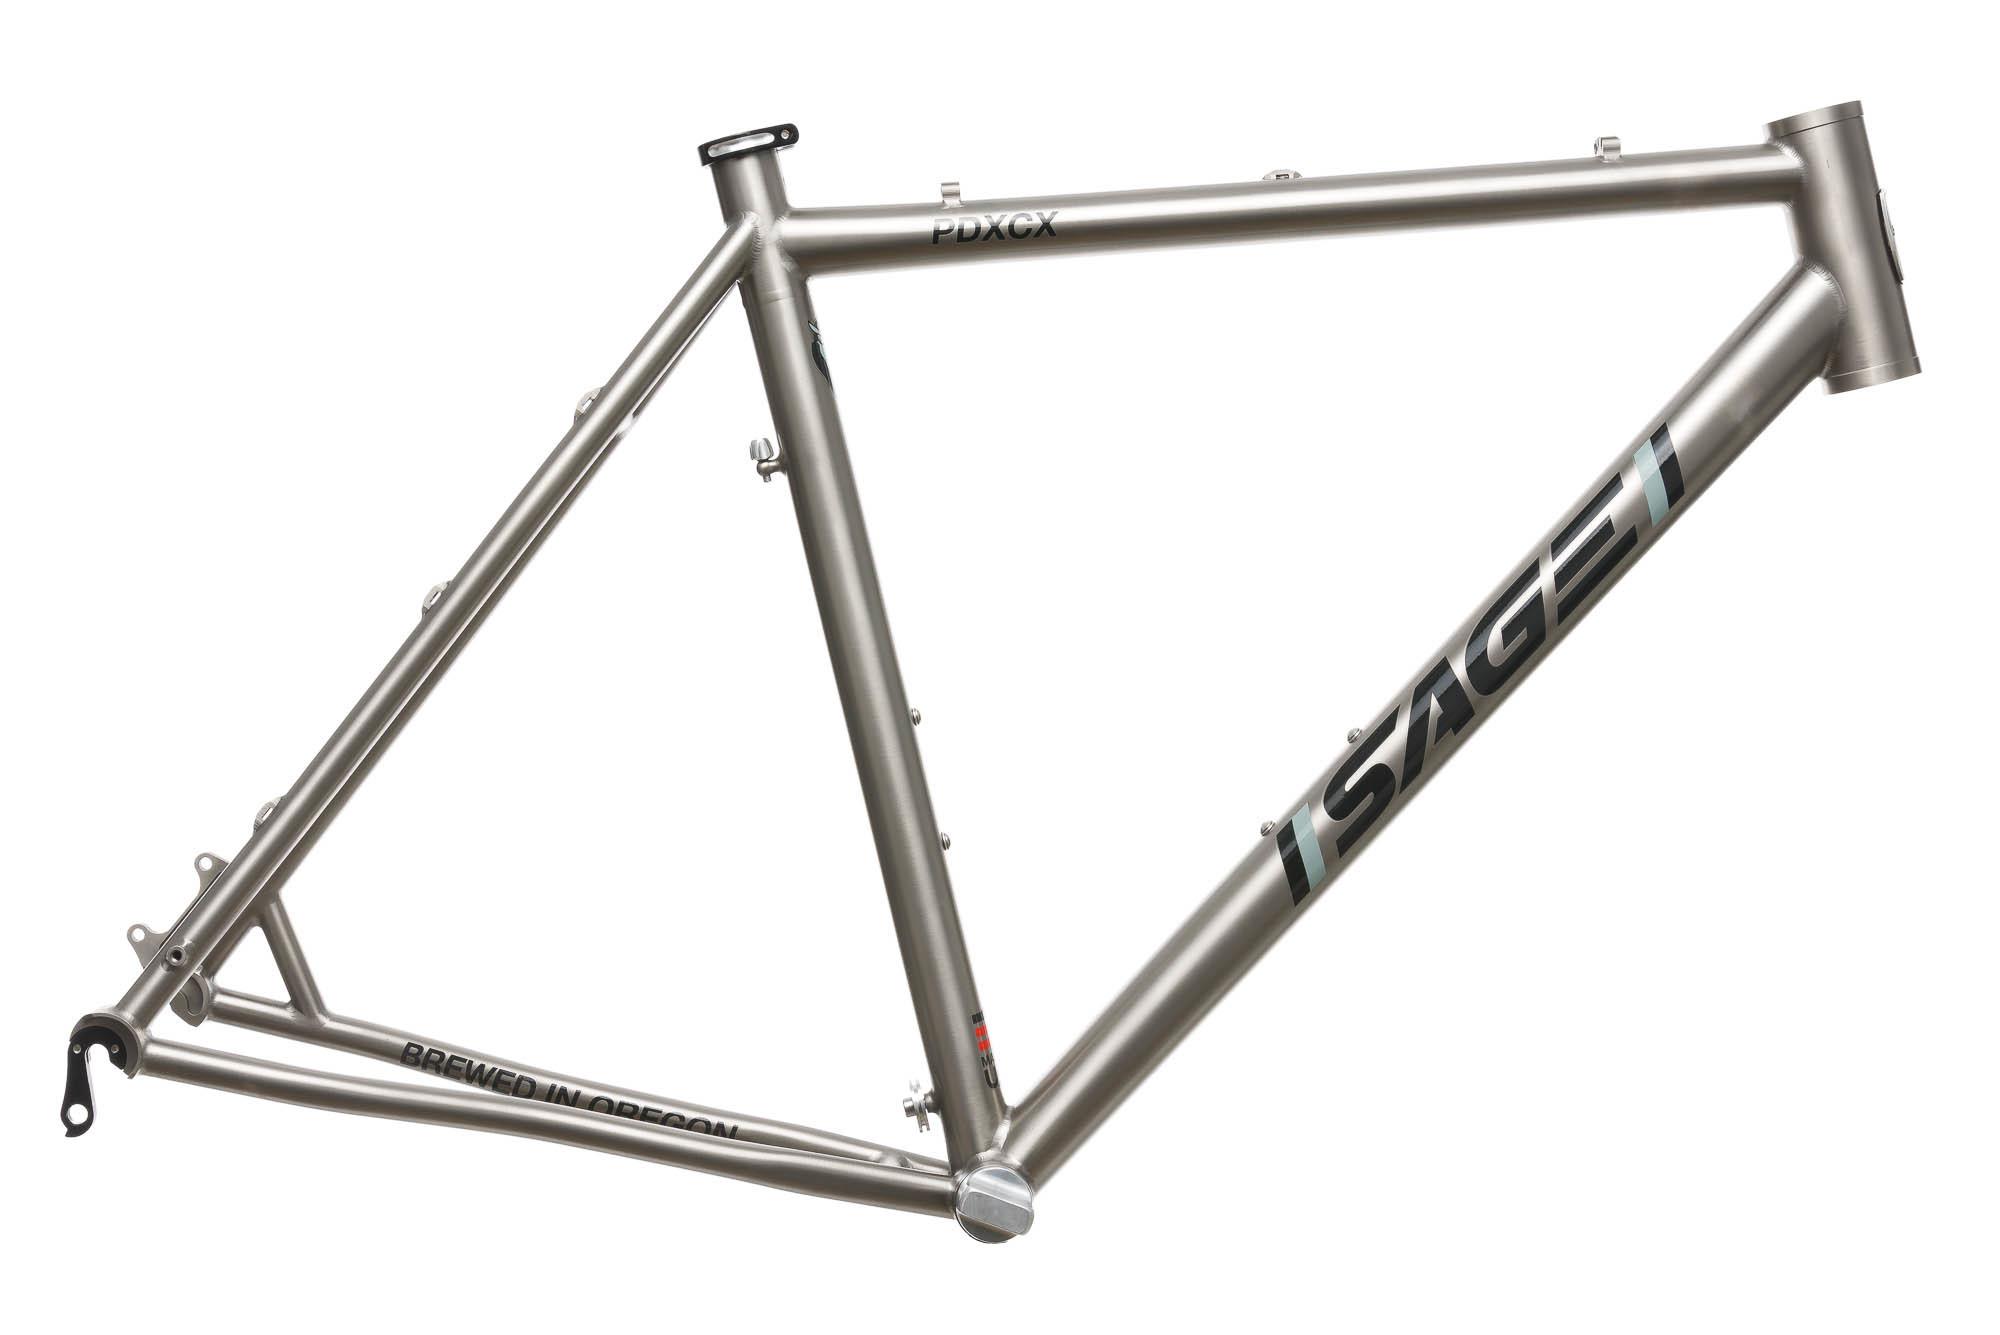 2016 Sage Titanium PDXCX Cyclocross Bike Frame 54cm MEDIUM Disc | eBay